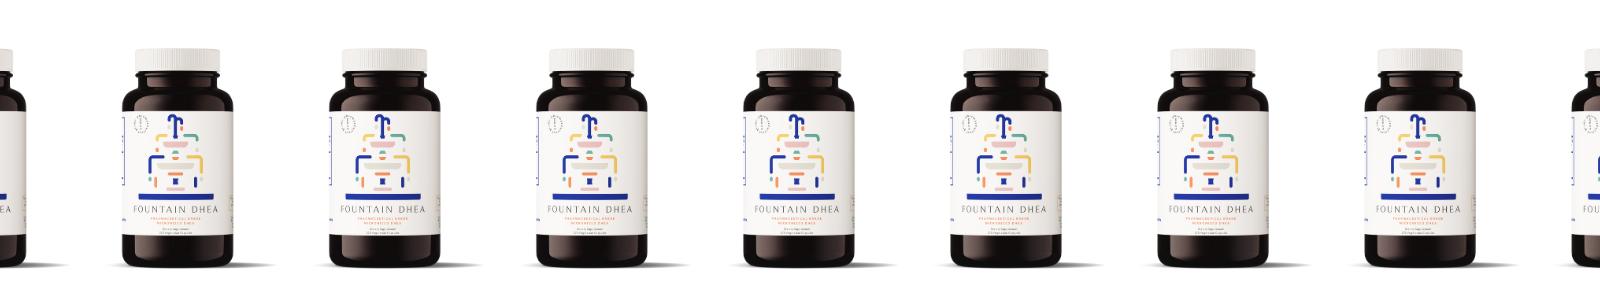 DHEA for Fertility - Fountain DHEA - Micronized Pharmaceutical Grade DHEA